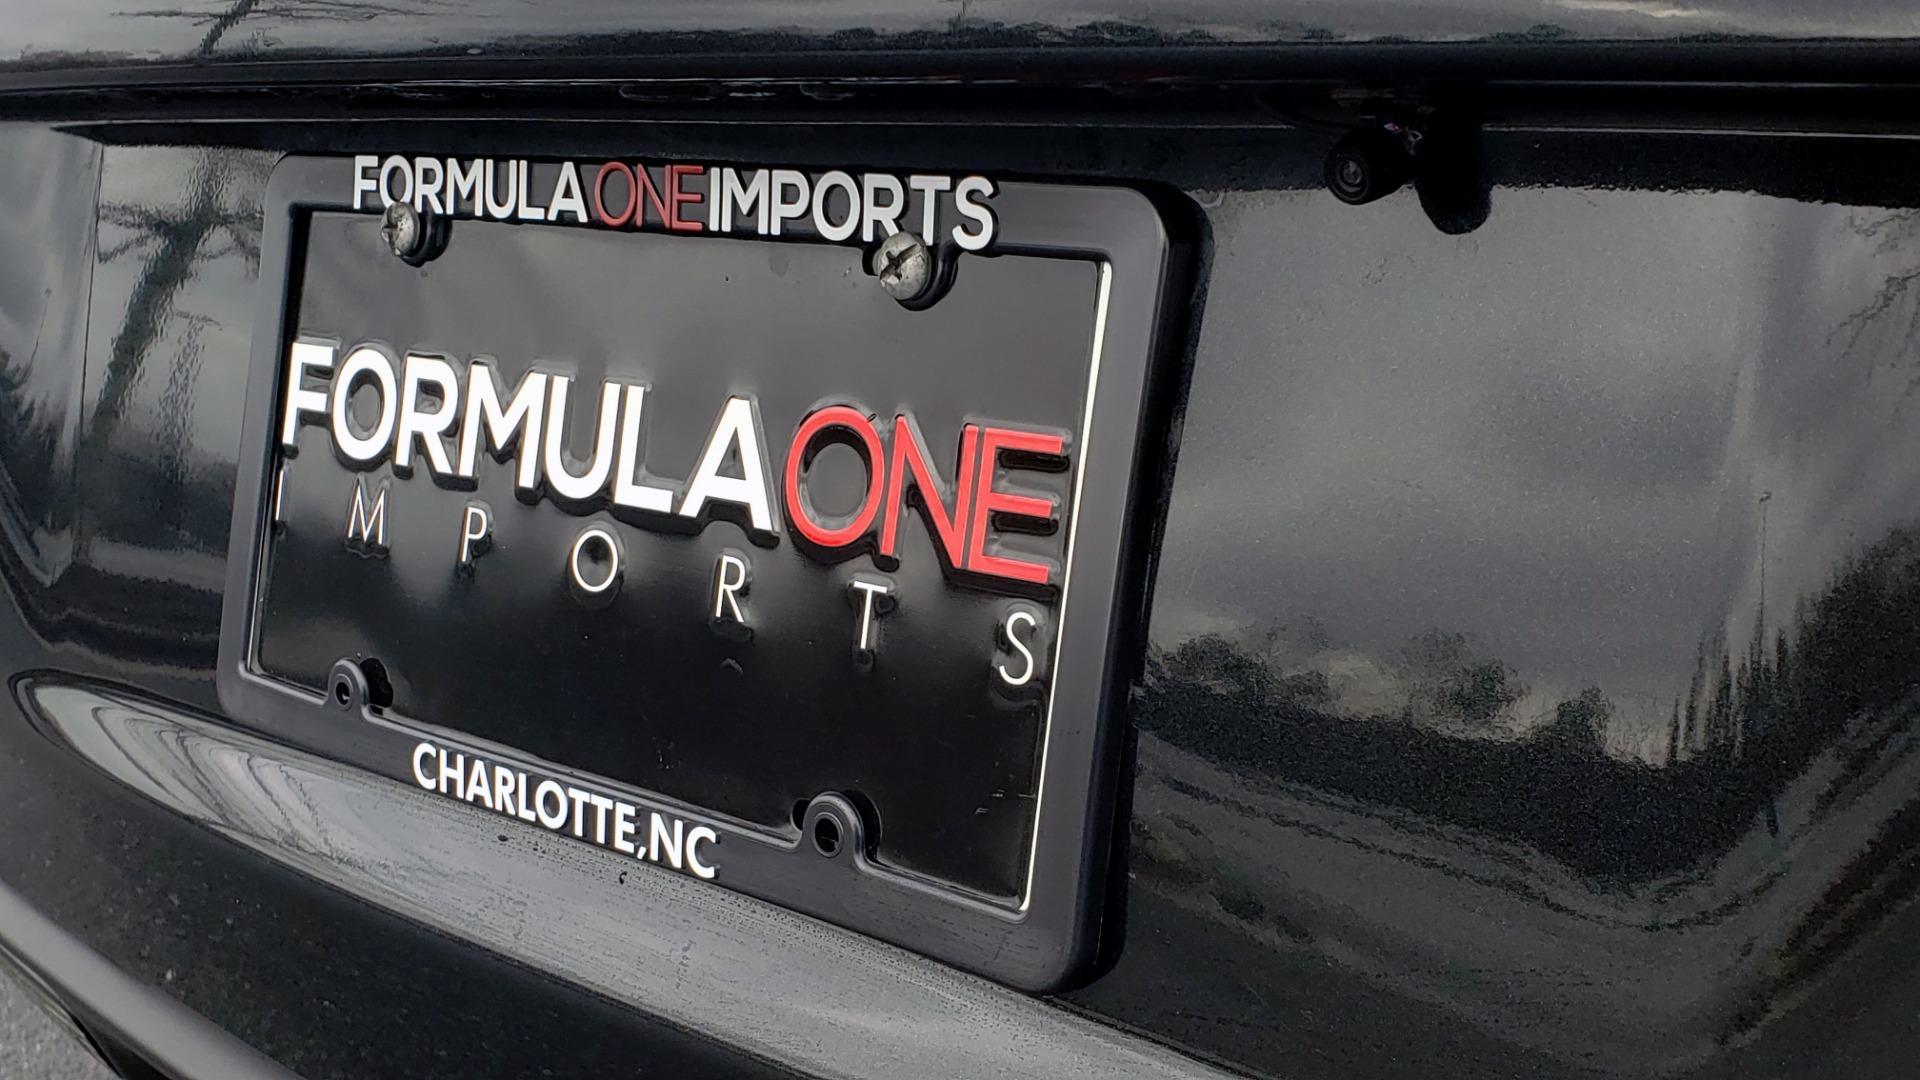 Used 2012 Chevrolet CORVETTE Z16 GRAND SPORT 3LT CONVERTIBLE / 6-SPD AUTO / NAV for sale $38,990 at Formula Imports in Charlotte NC 28227 39